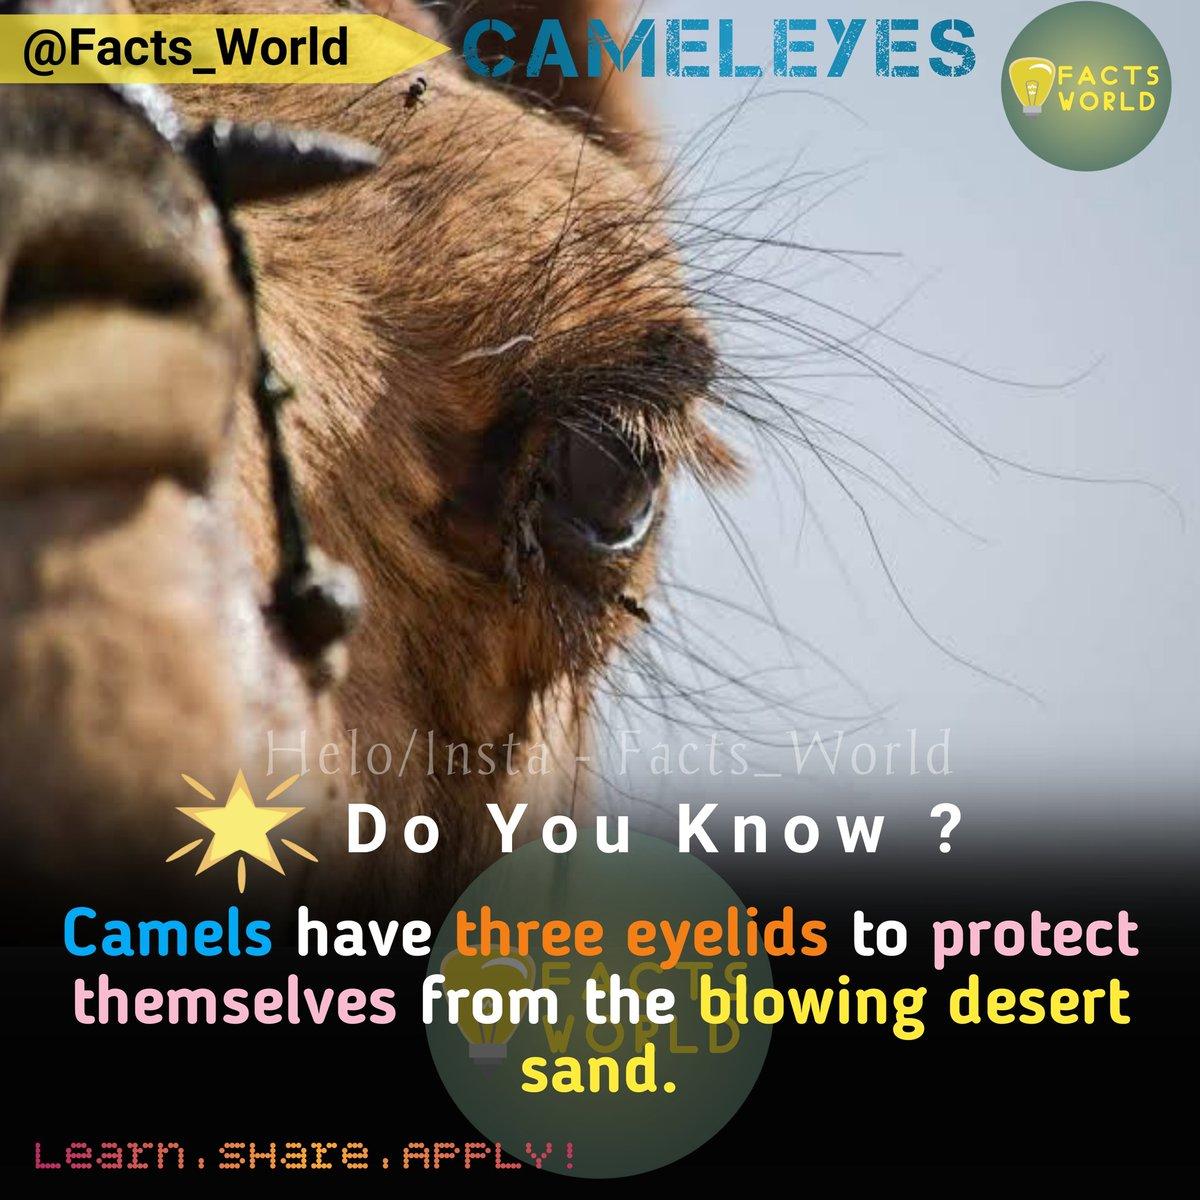 DO YOU KNOW ? Camels have three eyelids to protect themselves from the blowing desert sand. #hindifacts#factsinhindi#rochak#rochaktathya#rochaktathya123#rochakfacts#rochakjankari#rochak_tathya123#gyankibaat#gyan#gyanopedia#hindigk#upscmotivation#gajabthathya#gazabpost#upscgk pic.twitter.com/XjnjrF7g9n